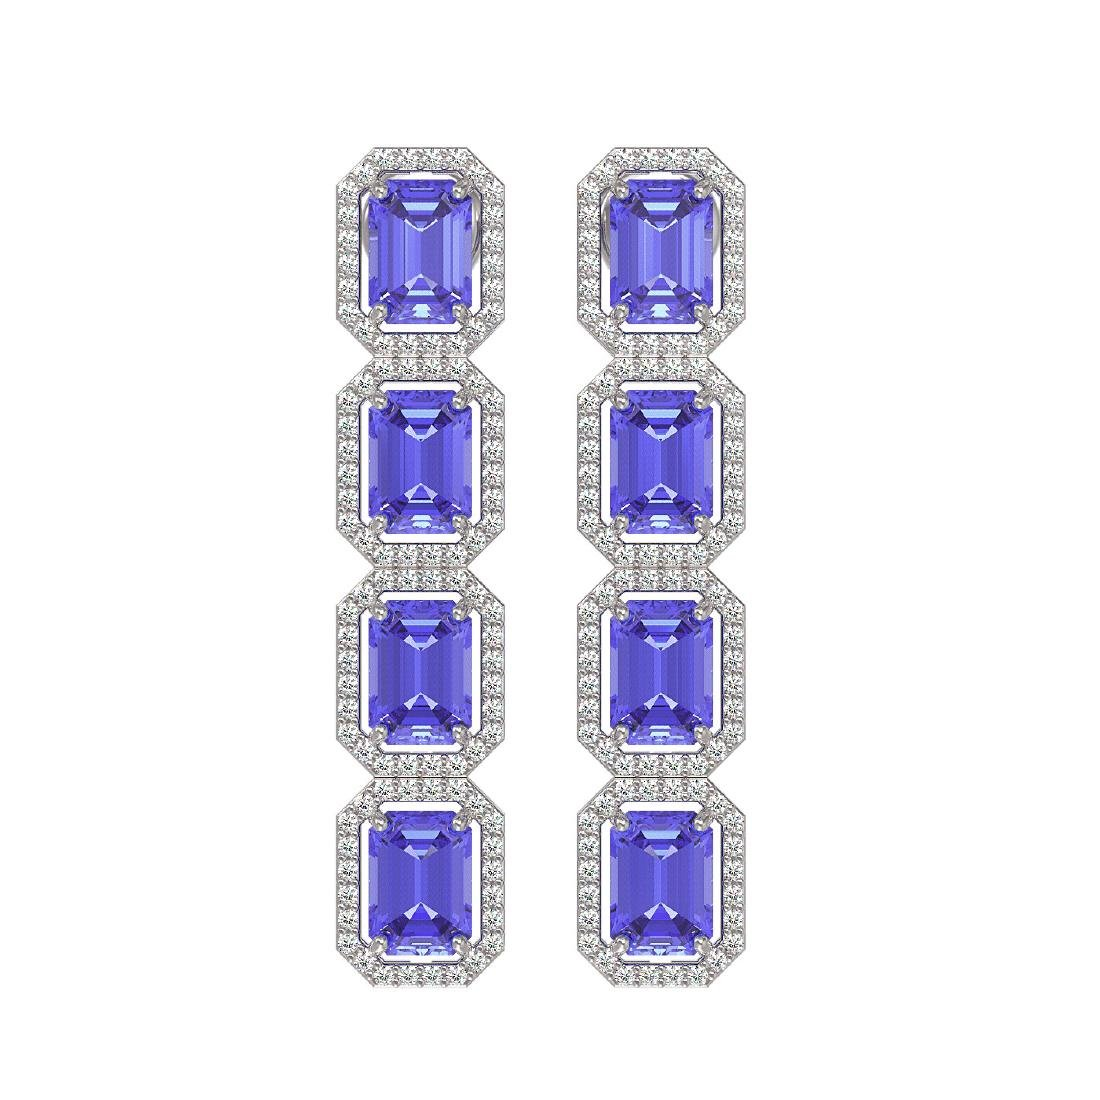 11.93 CTW Tanzanite & Diamond Halo Earrings 10K White